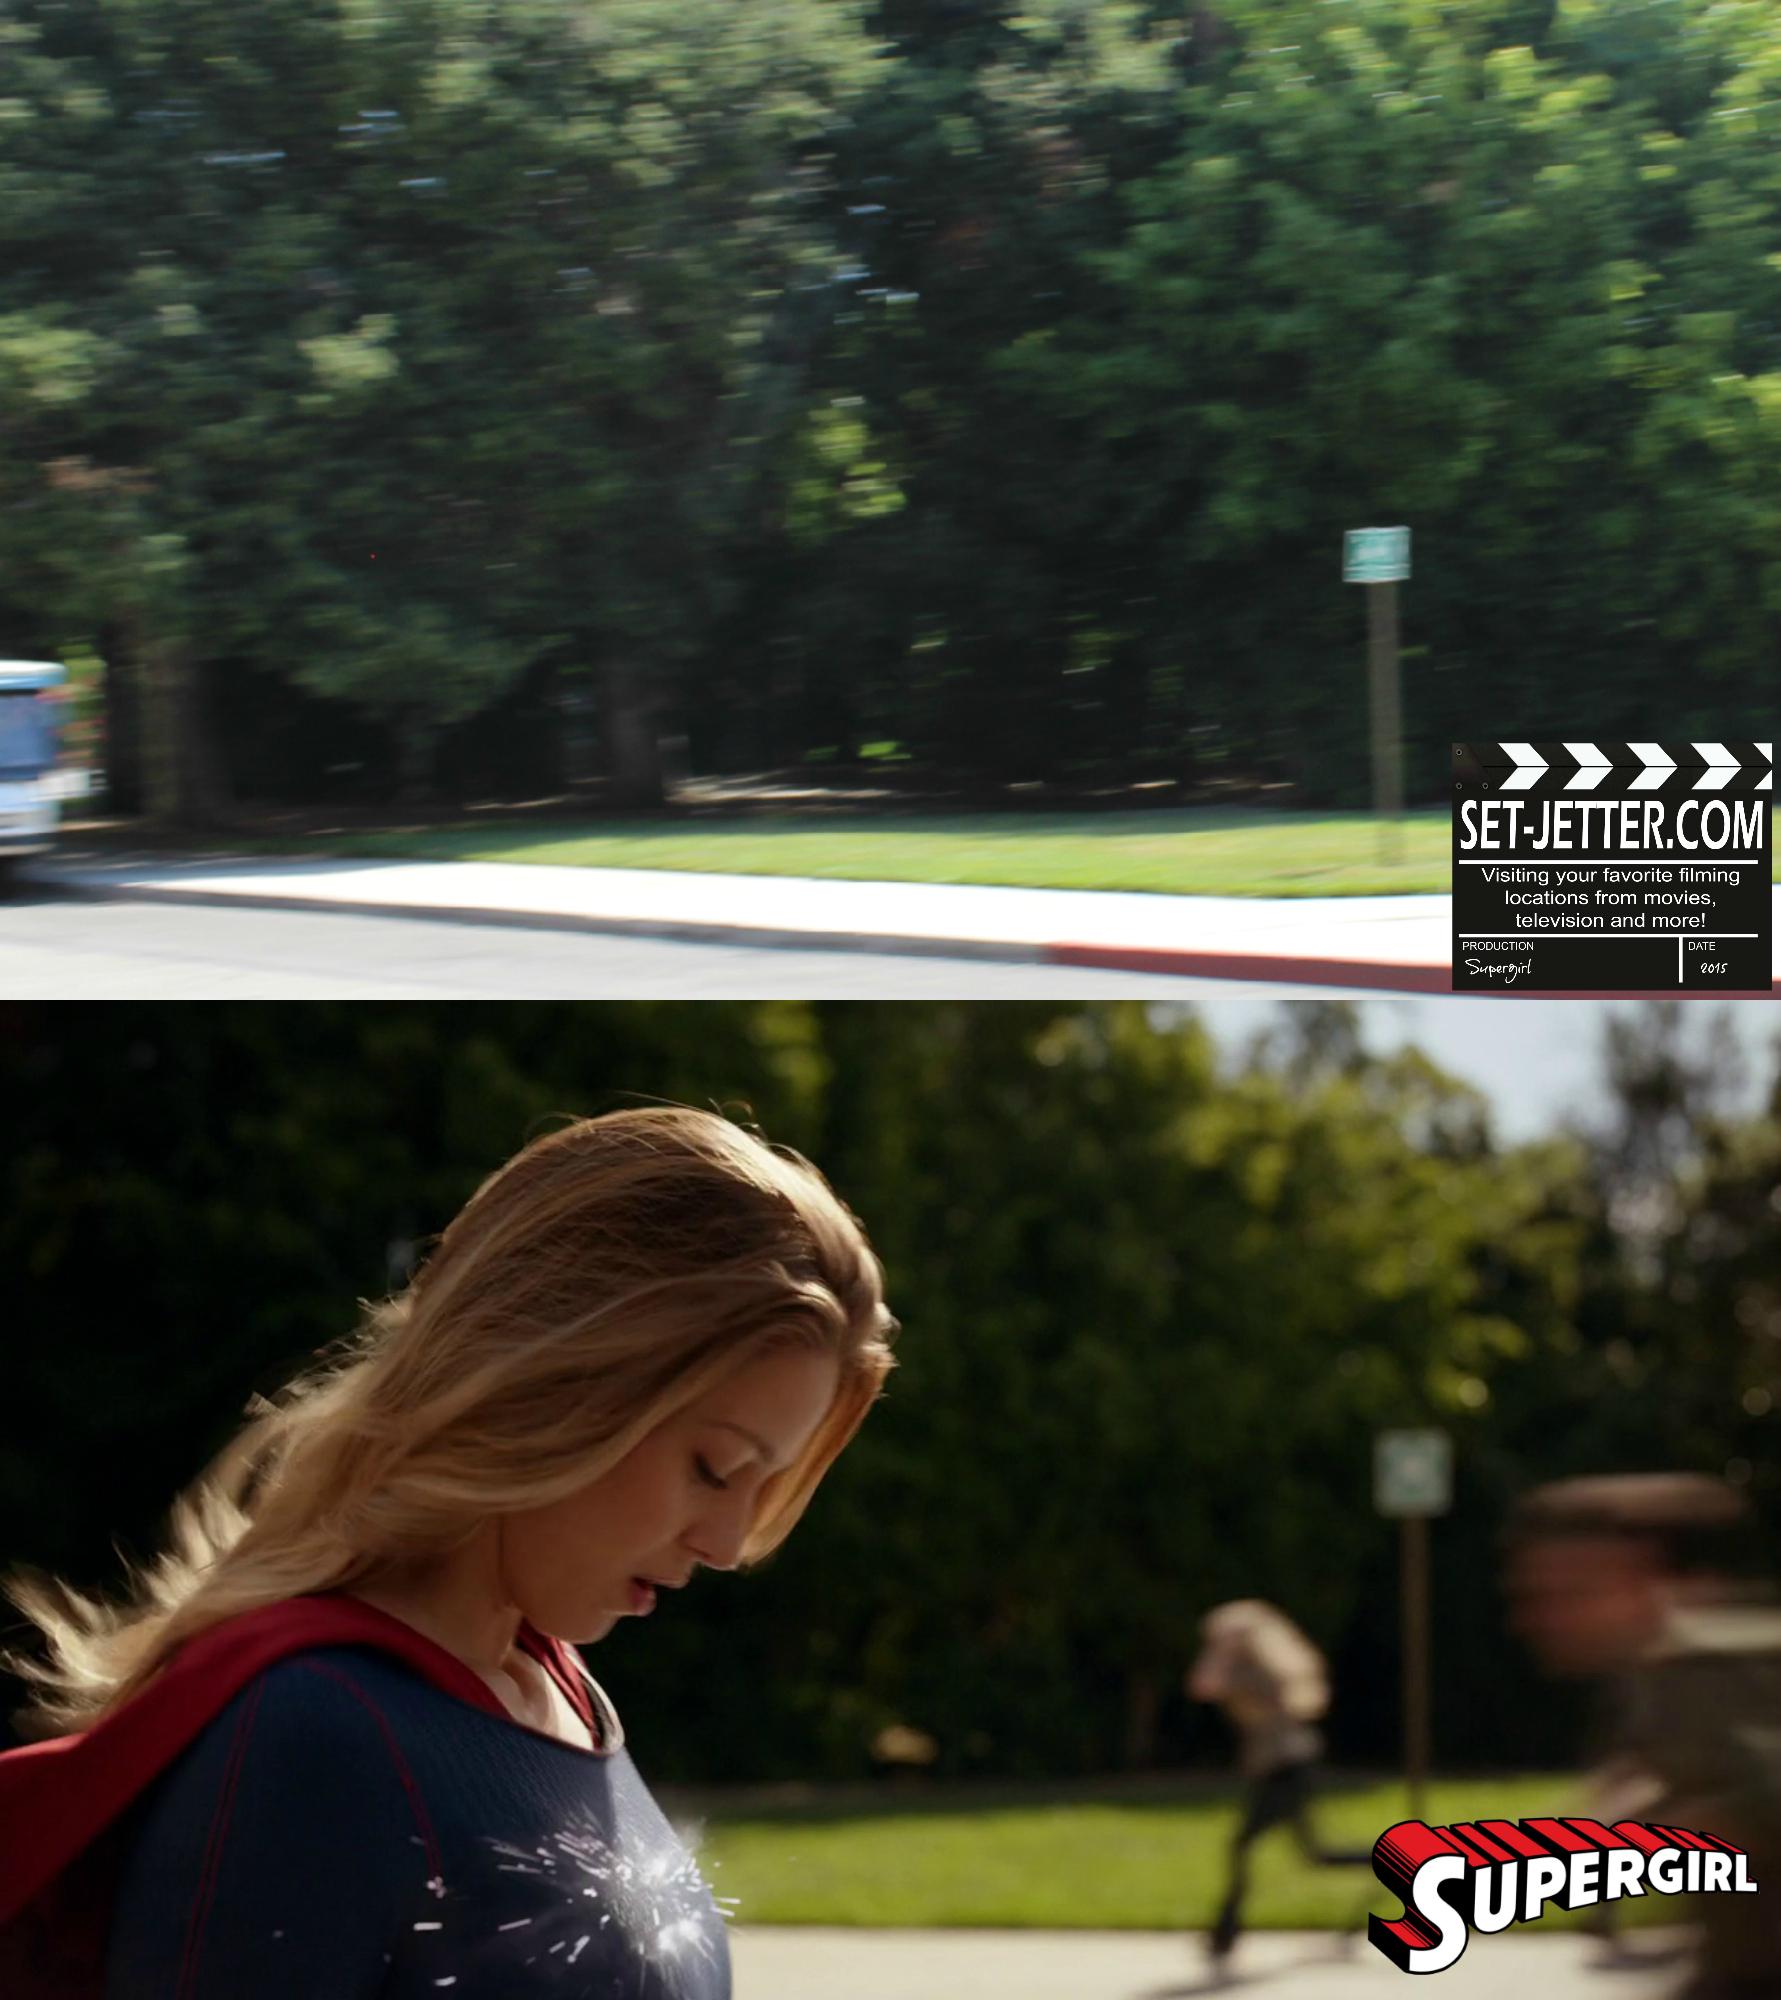 Supergirl comparison 25.jpg